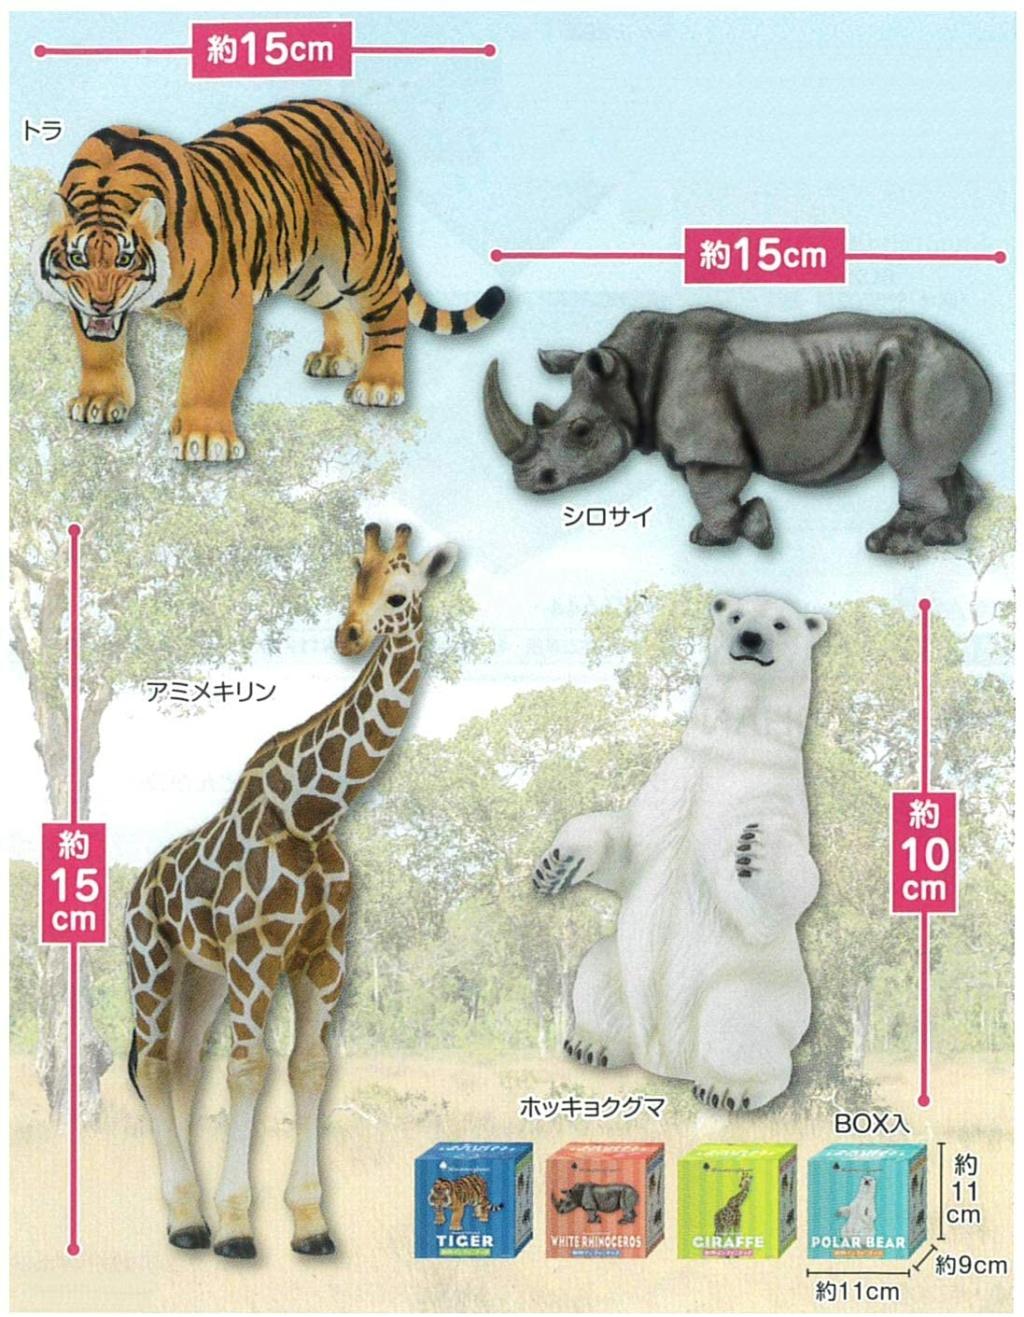 Eikoh - bigger models - walkarounds - Page 2 71sfna10